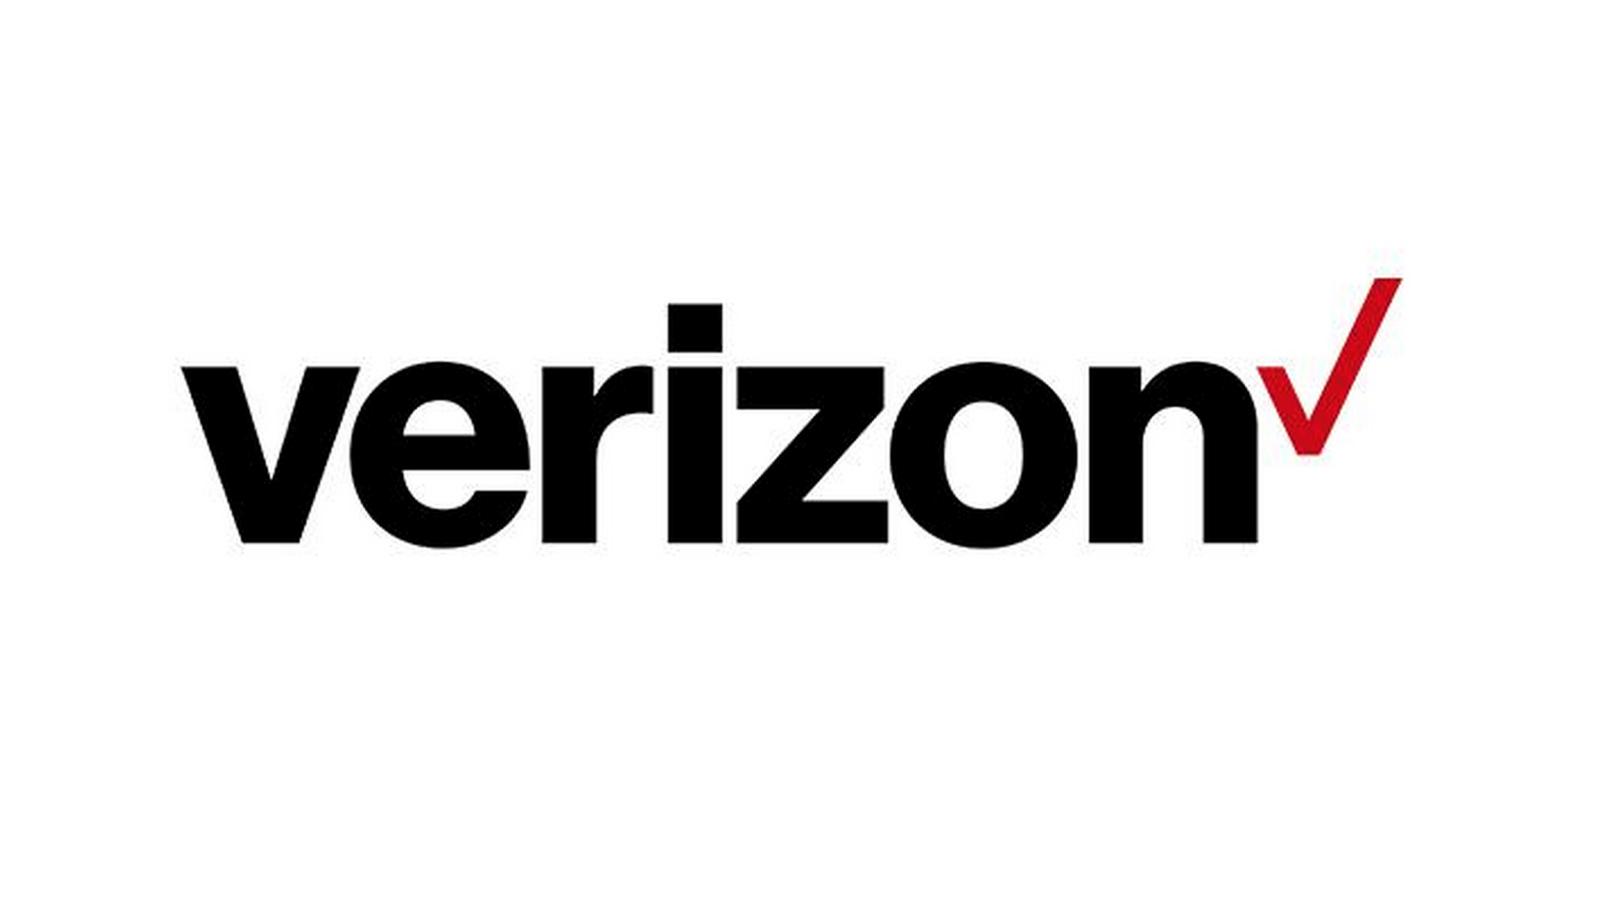 Verizon Wireless 200$ off on Android phones - Upgrades eligible YMMV